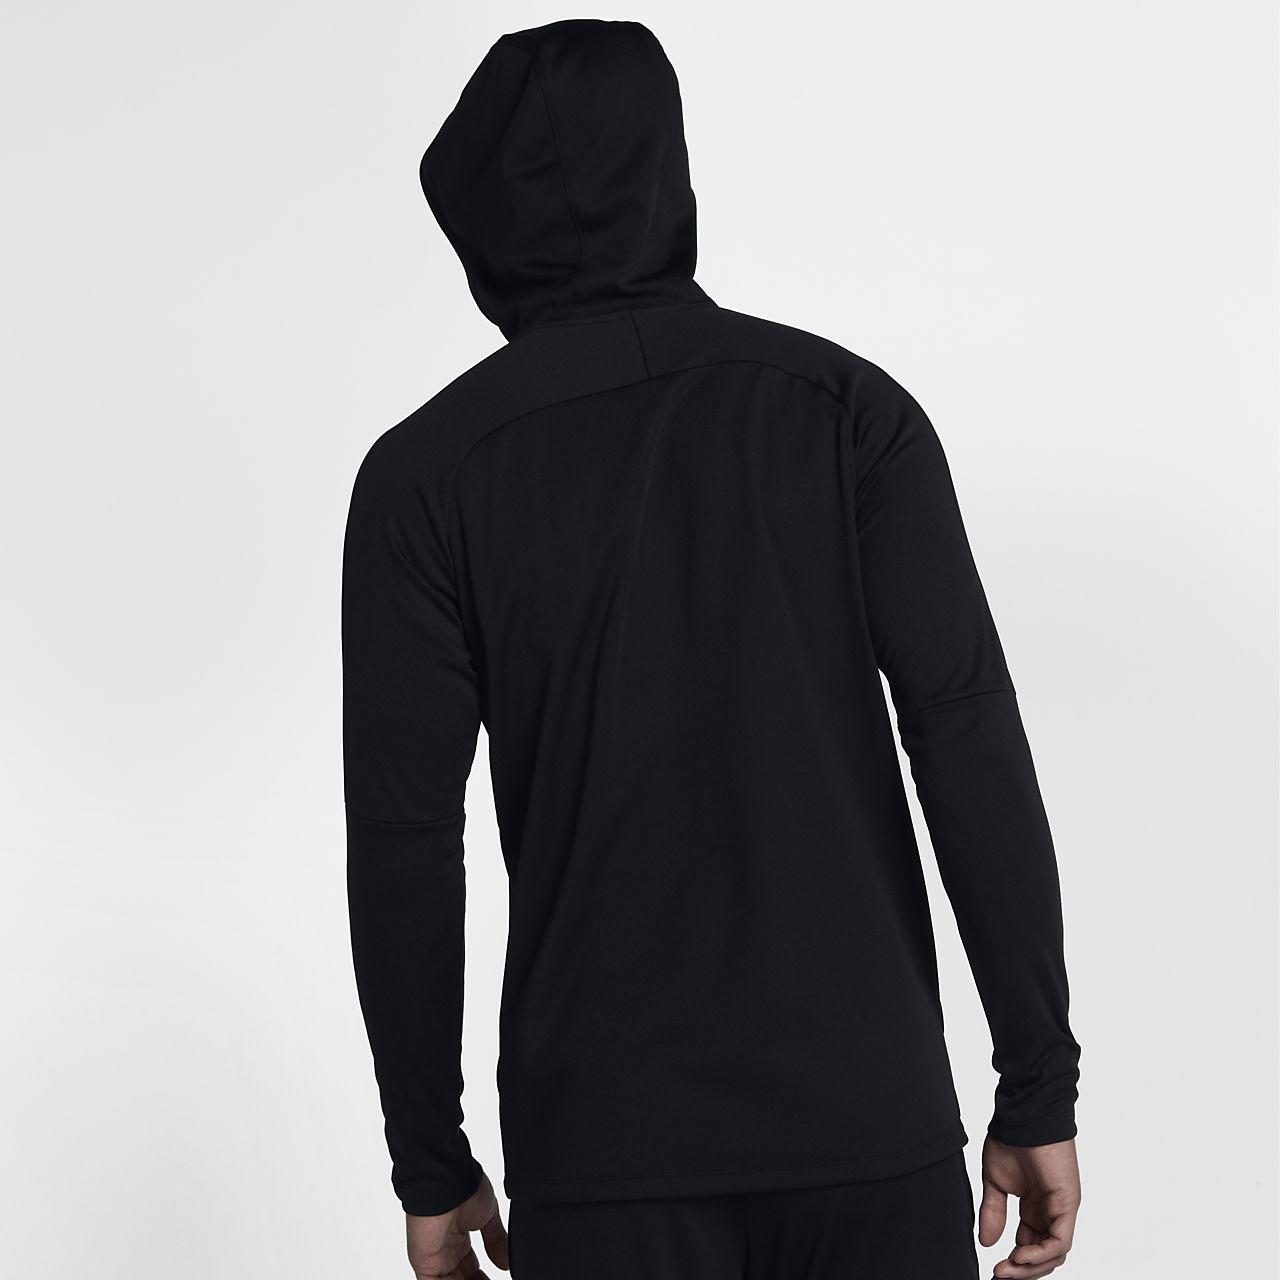 a76f2e7c0 Nike Dri-FIT Academy Sudadera con capucha de fútbol - Hombre. Nike ...